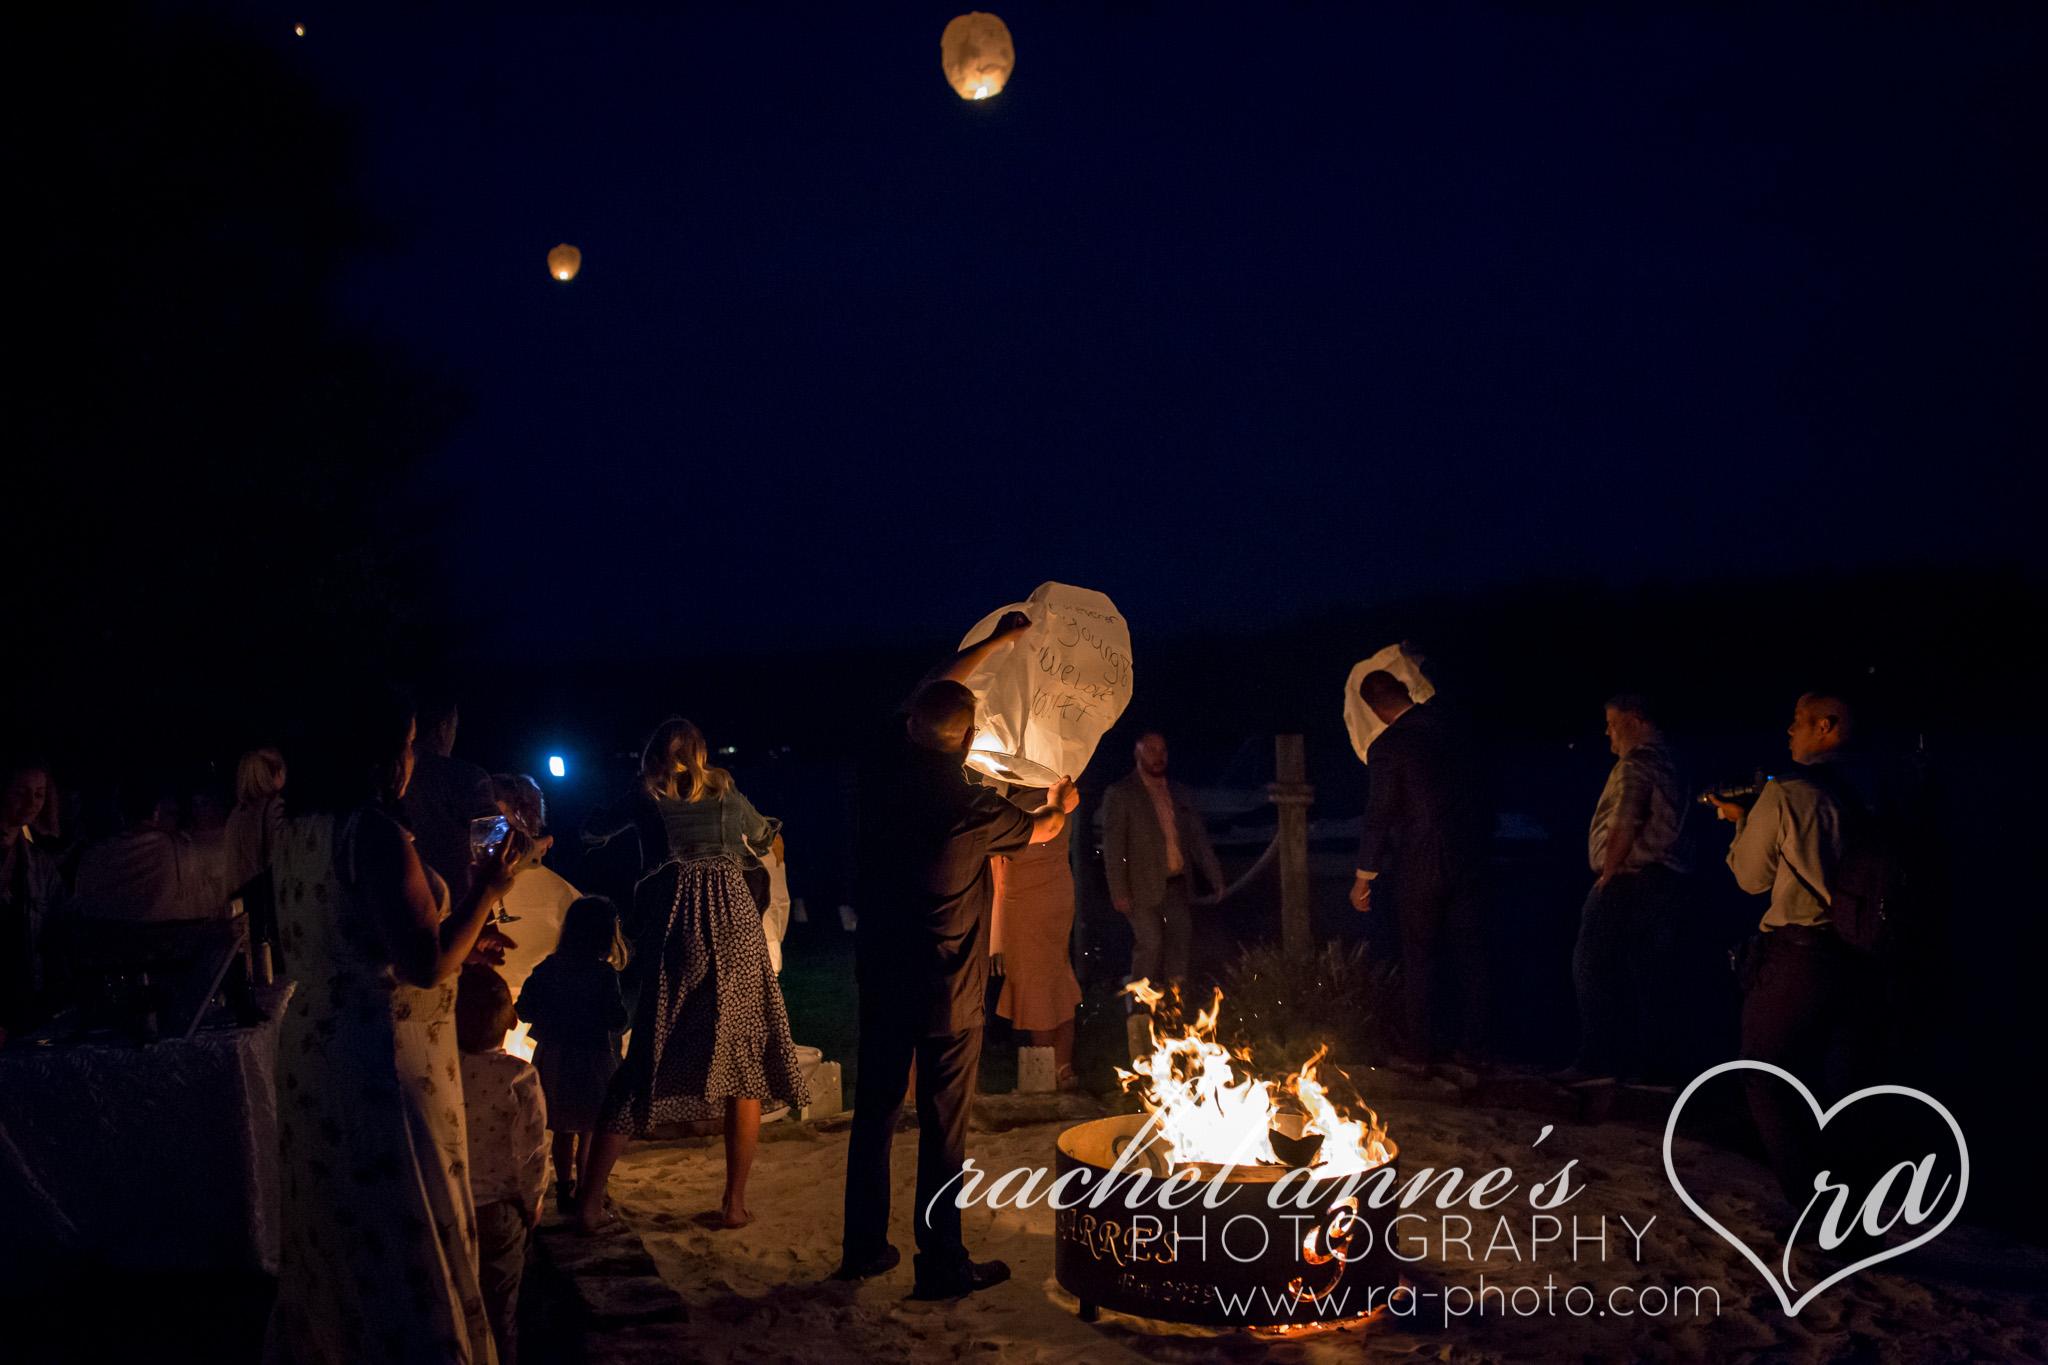 082-JJG-REHEARSAL-WEDDING-TREASURE-LAKE-DUBOIS-PA.jpg